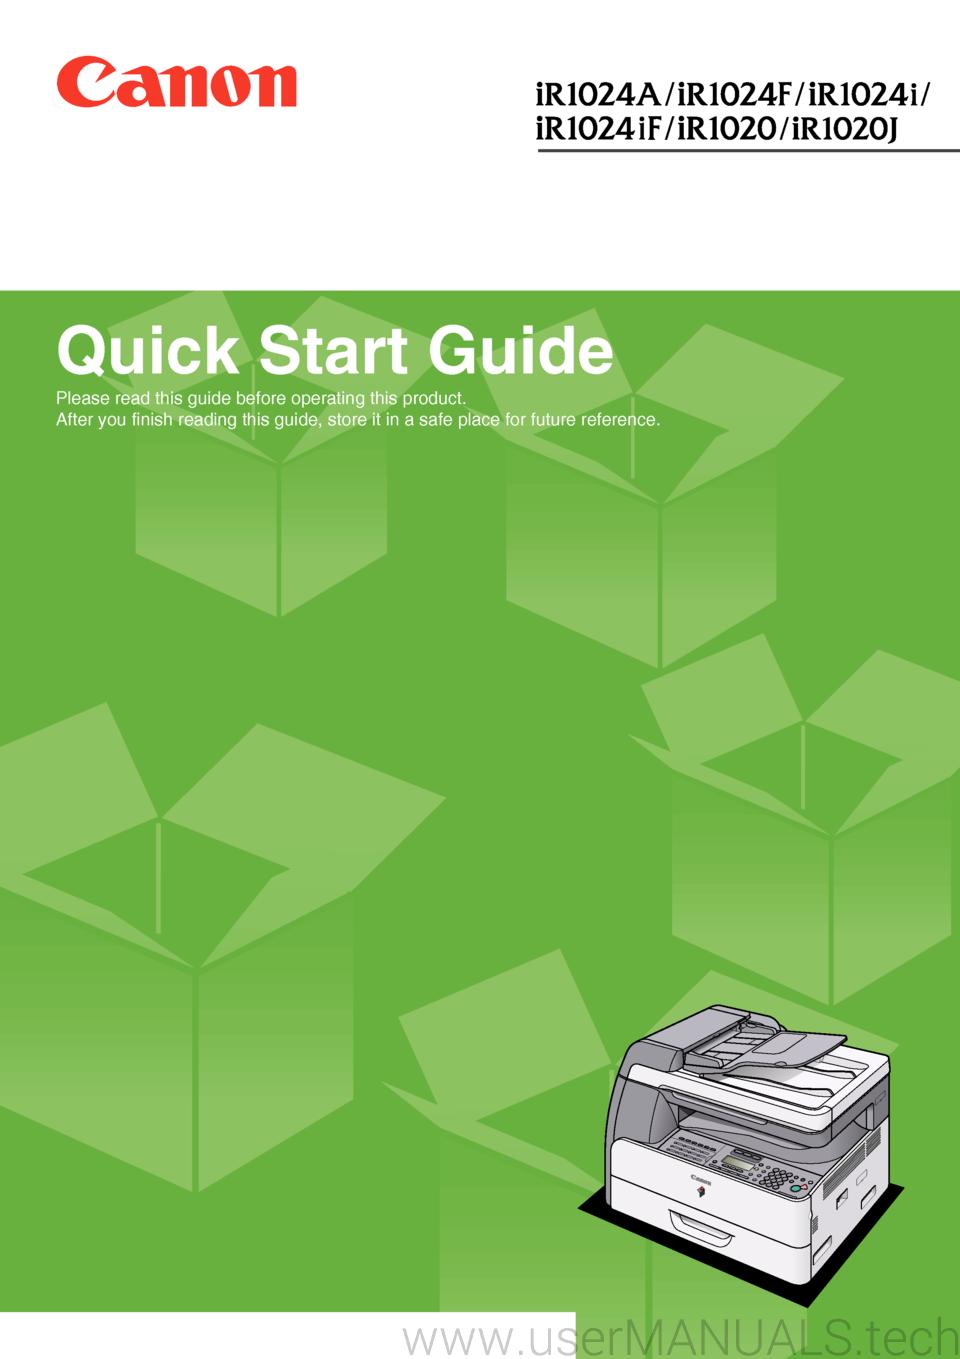 windows 10 quick start guide